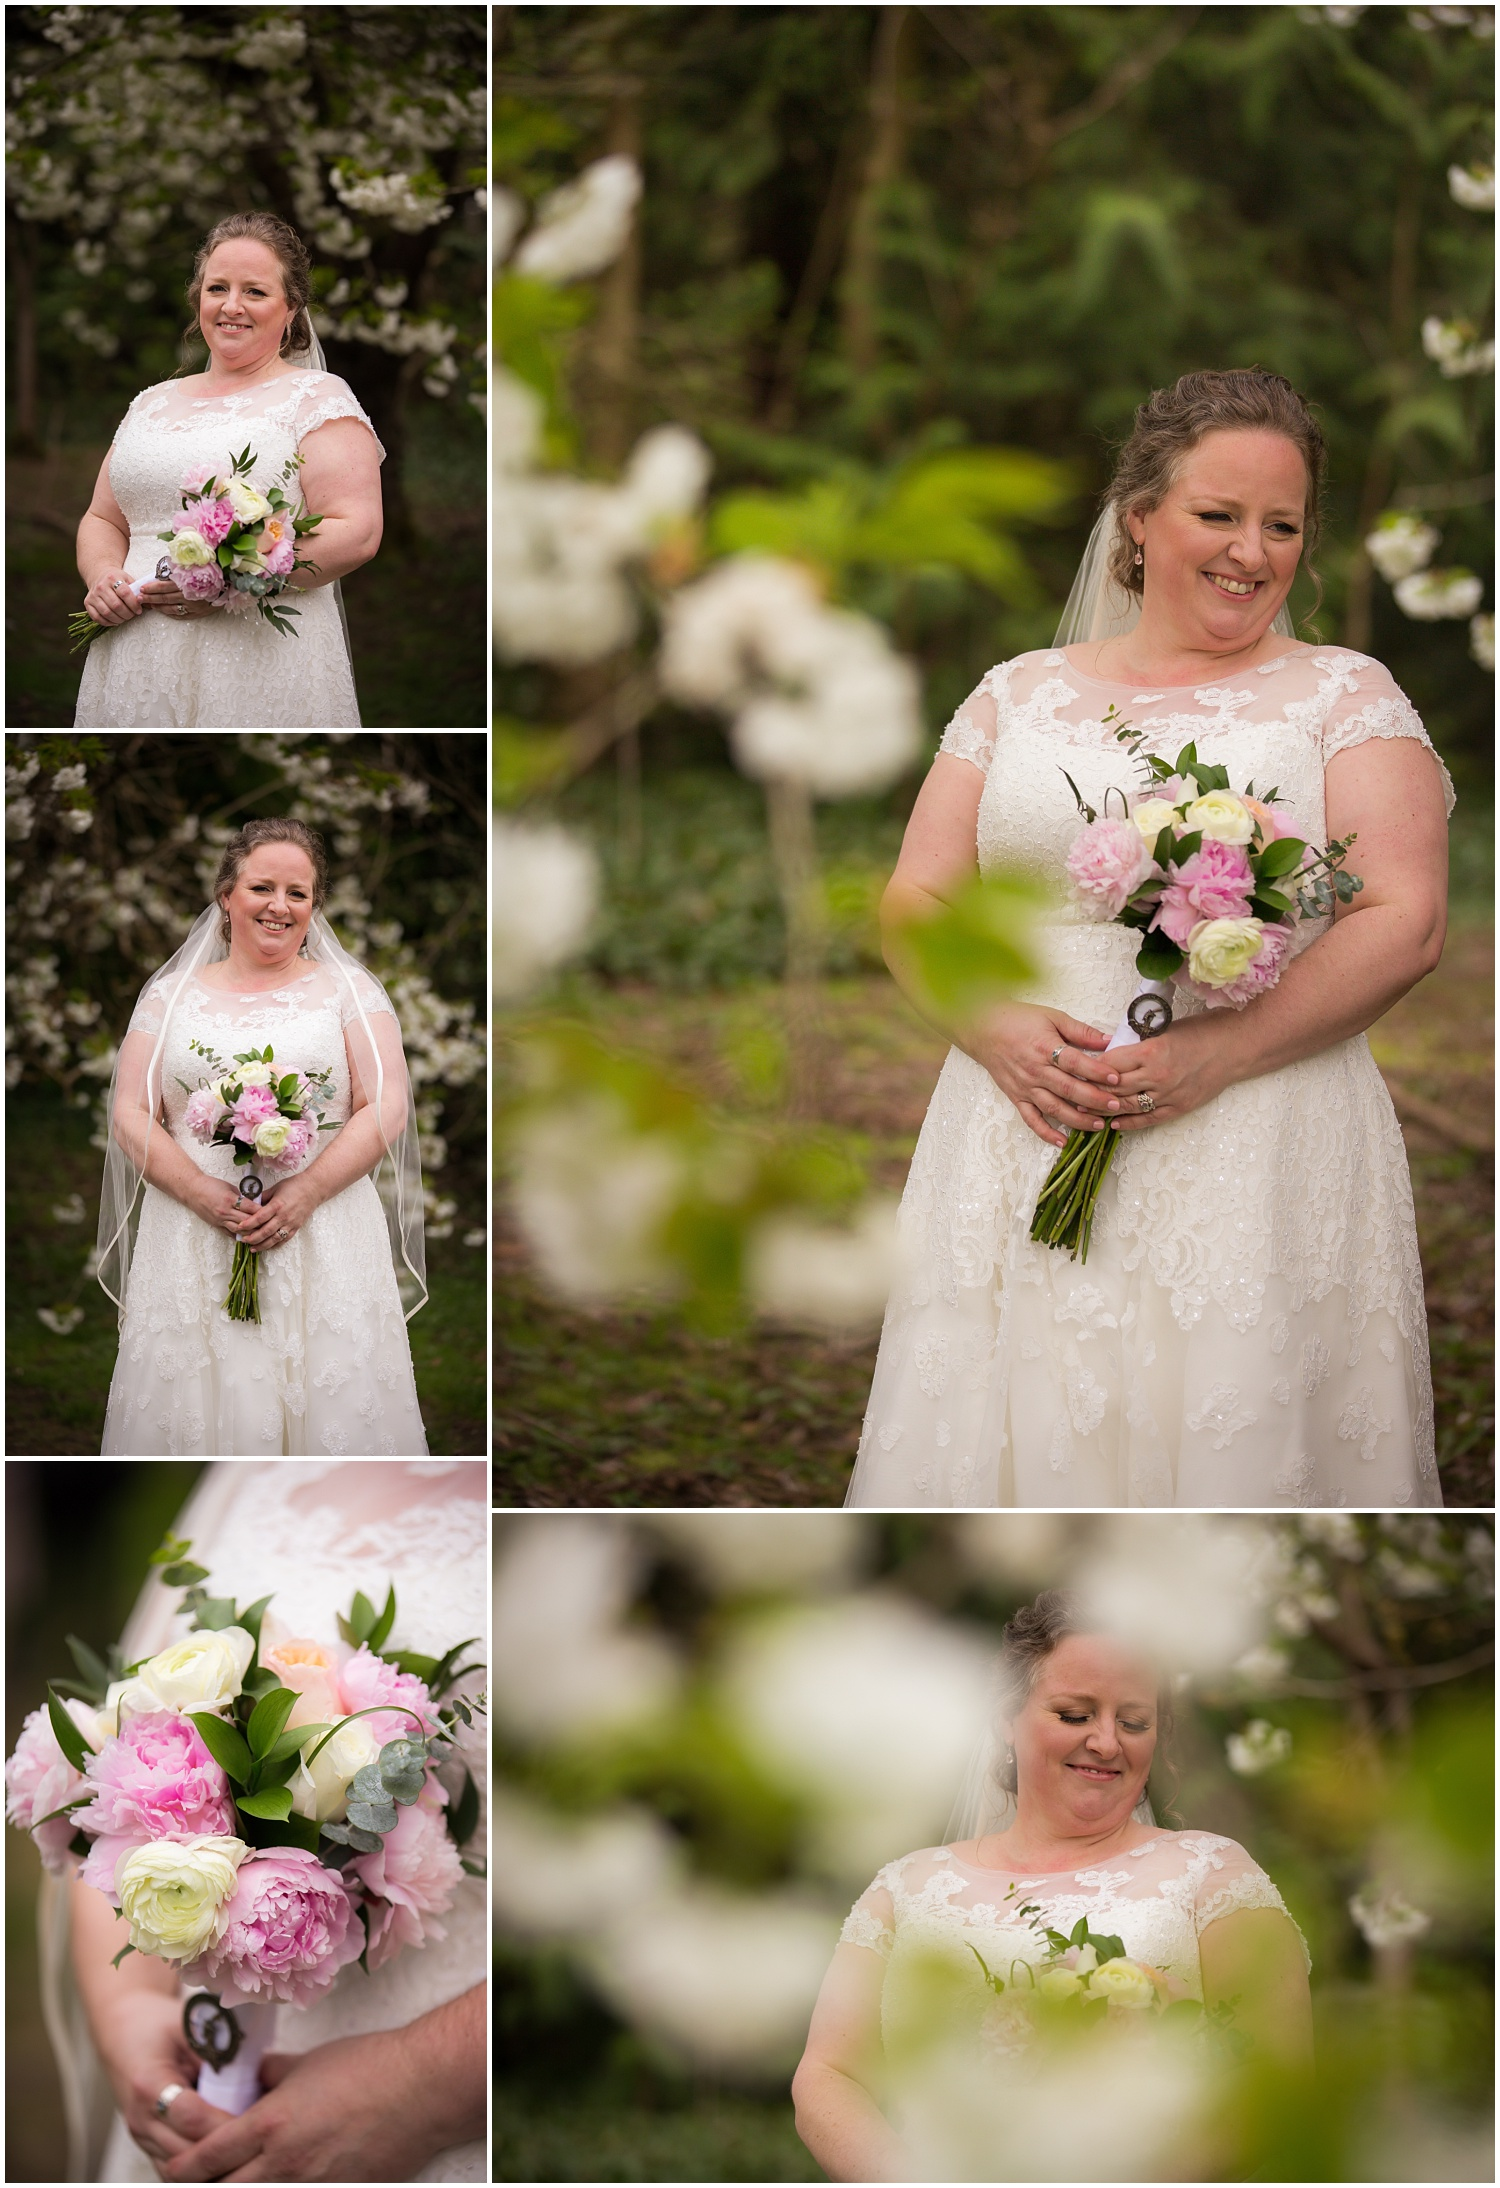 Amazing Day Photography - Hart House Wedding - Deer Lake Park Wedding - Burnaby Wedding Photographer (6).jpg